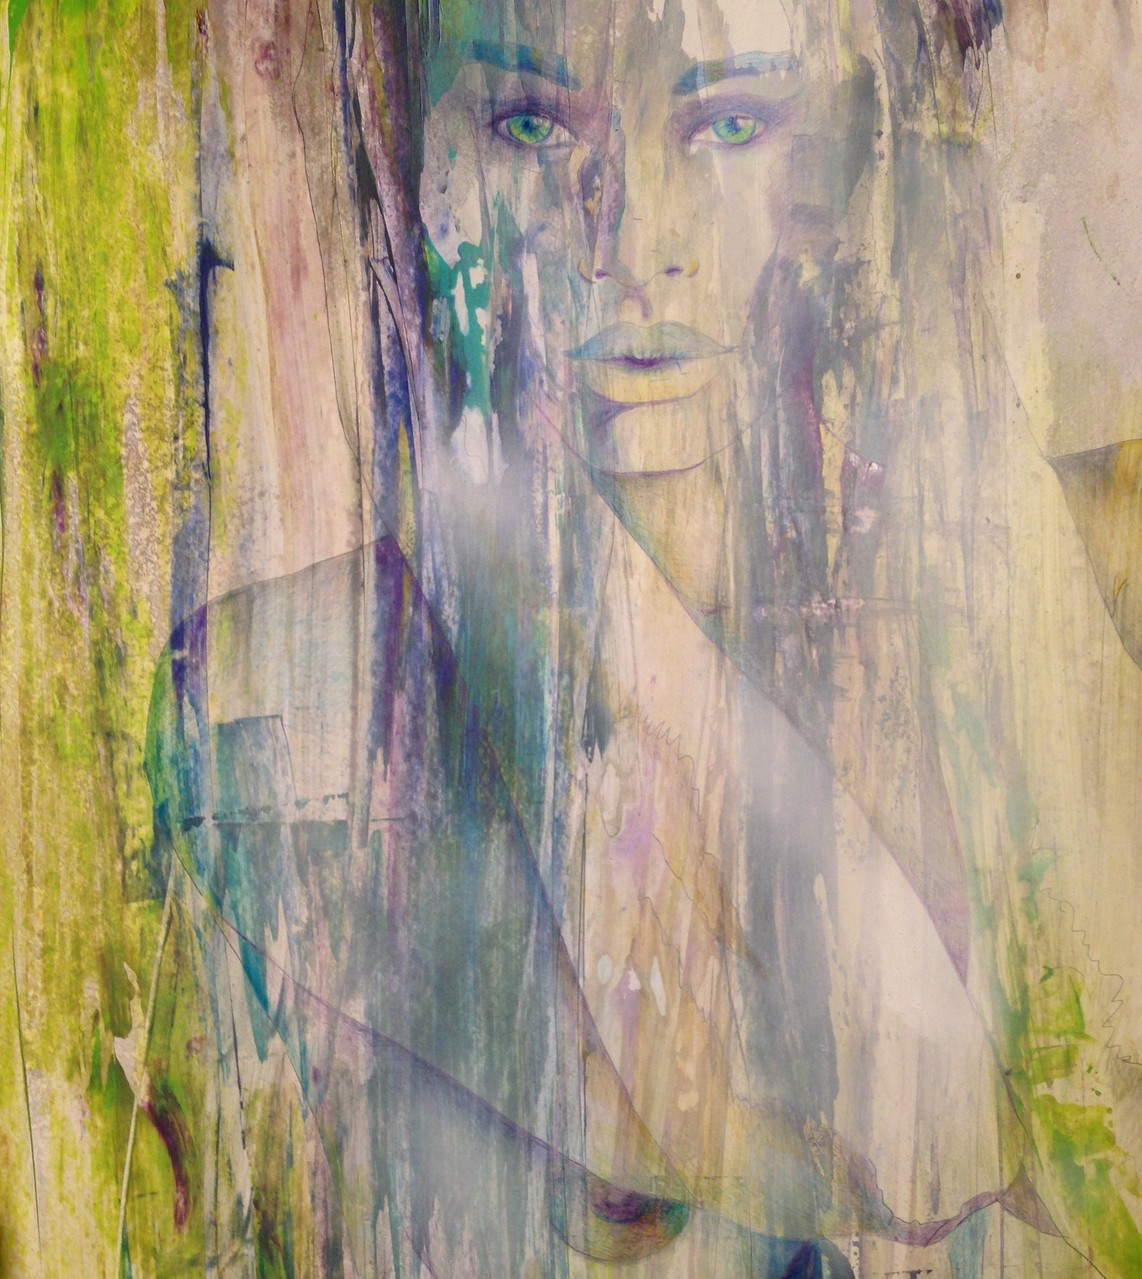 Nomia,  Acryl und Aquarellstift auf Karton, 70 x 50 cm